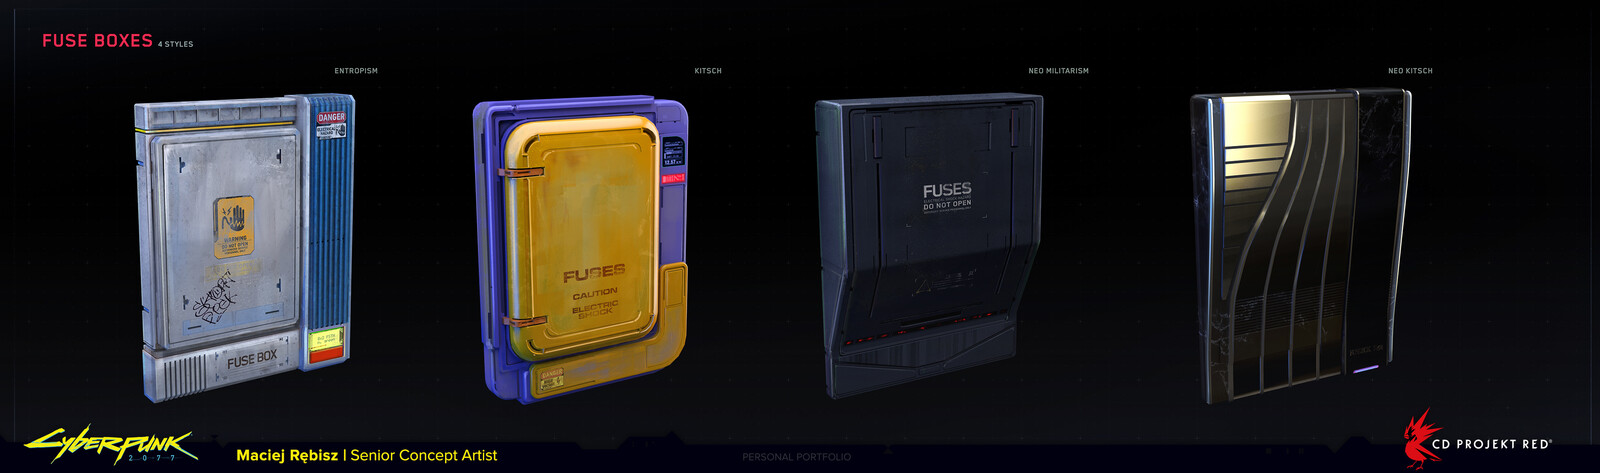 Fuse boxes